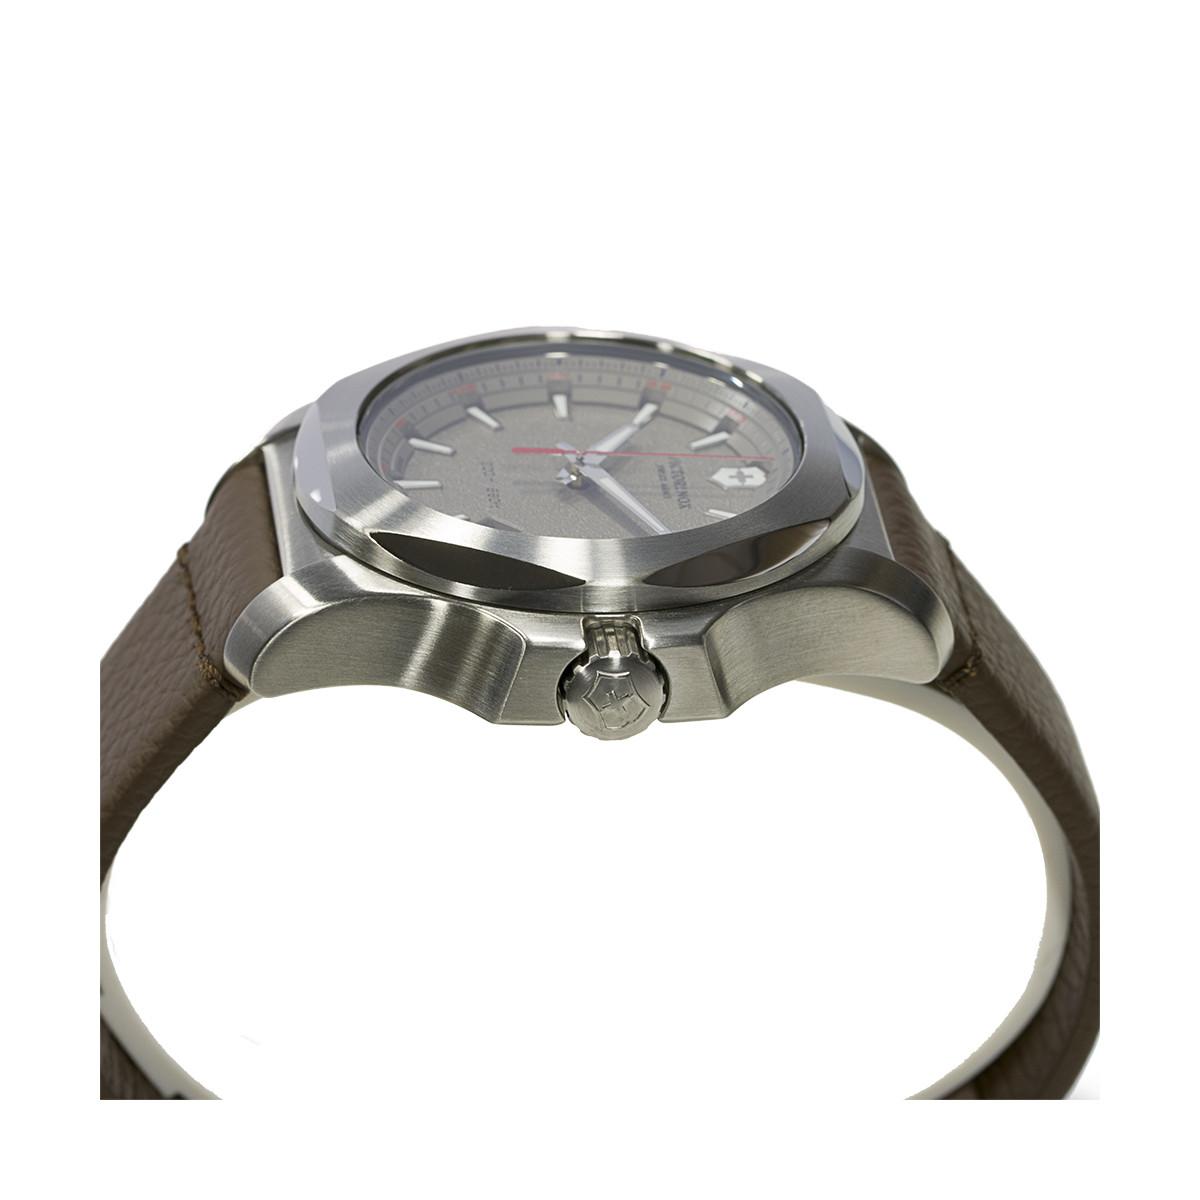 Montre Homme Victorinox I.N.O.X. cadran gris, bracelet cuir marron - 43 mm